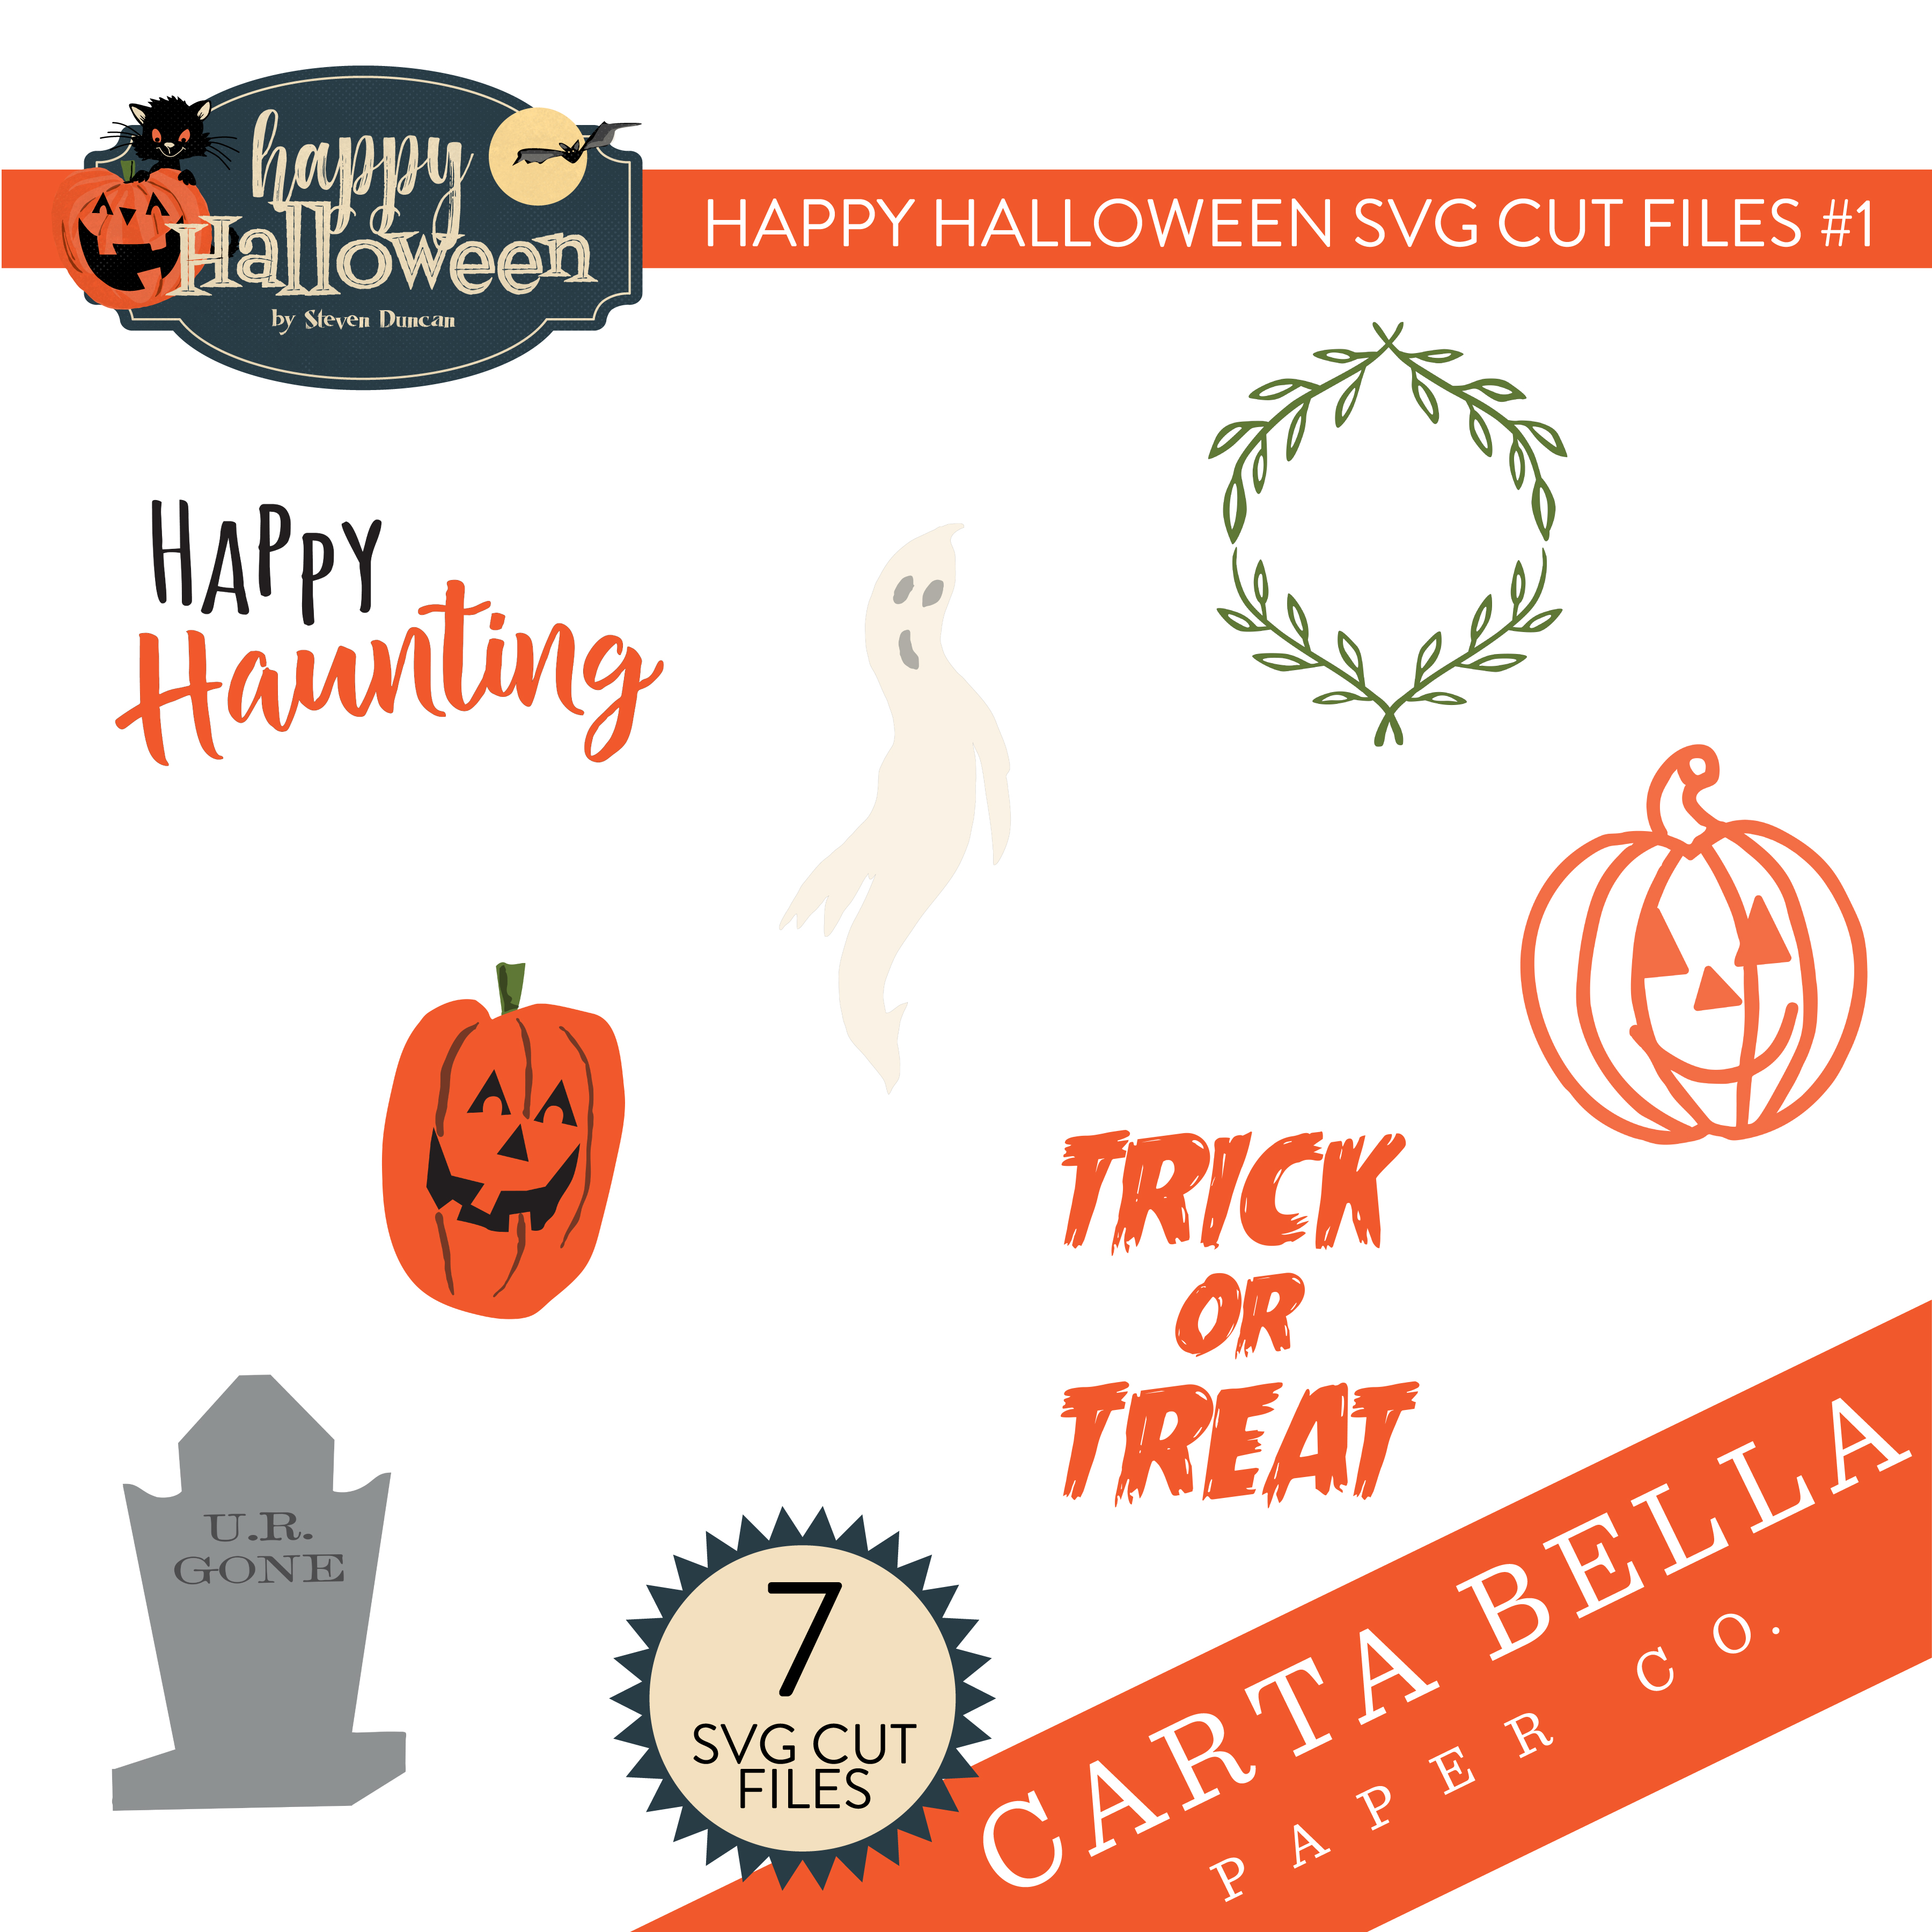 Happy Halloween SVG Cut Files #1